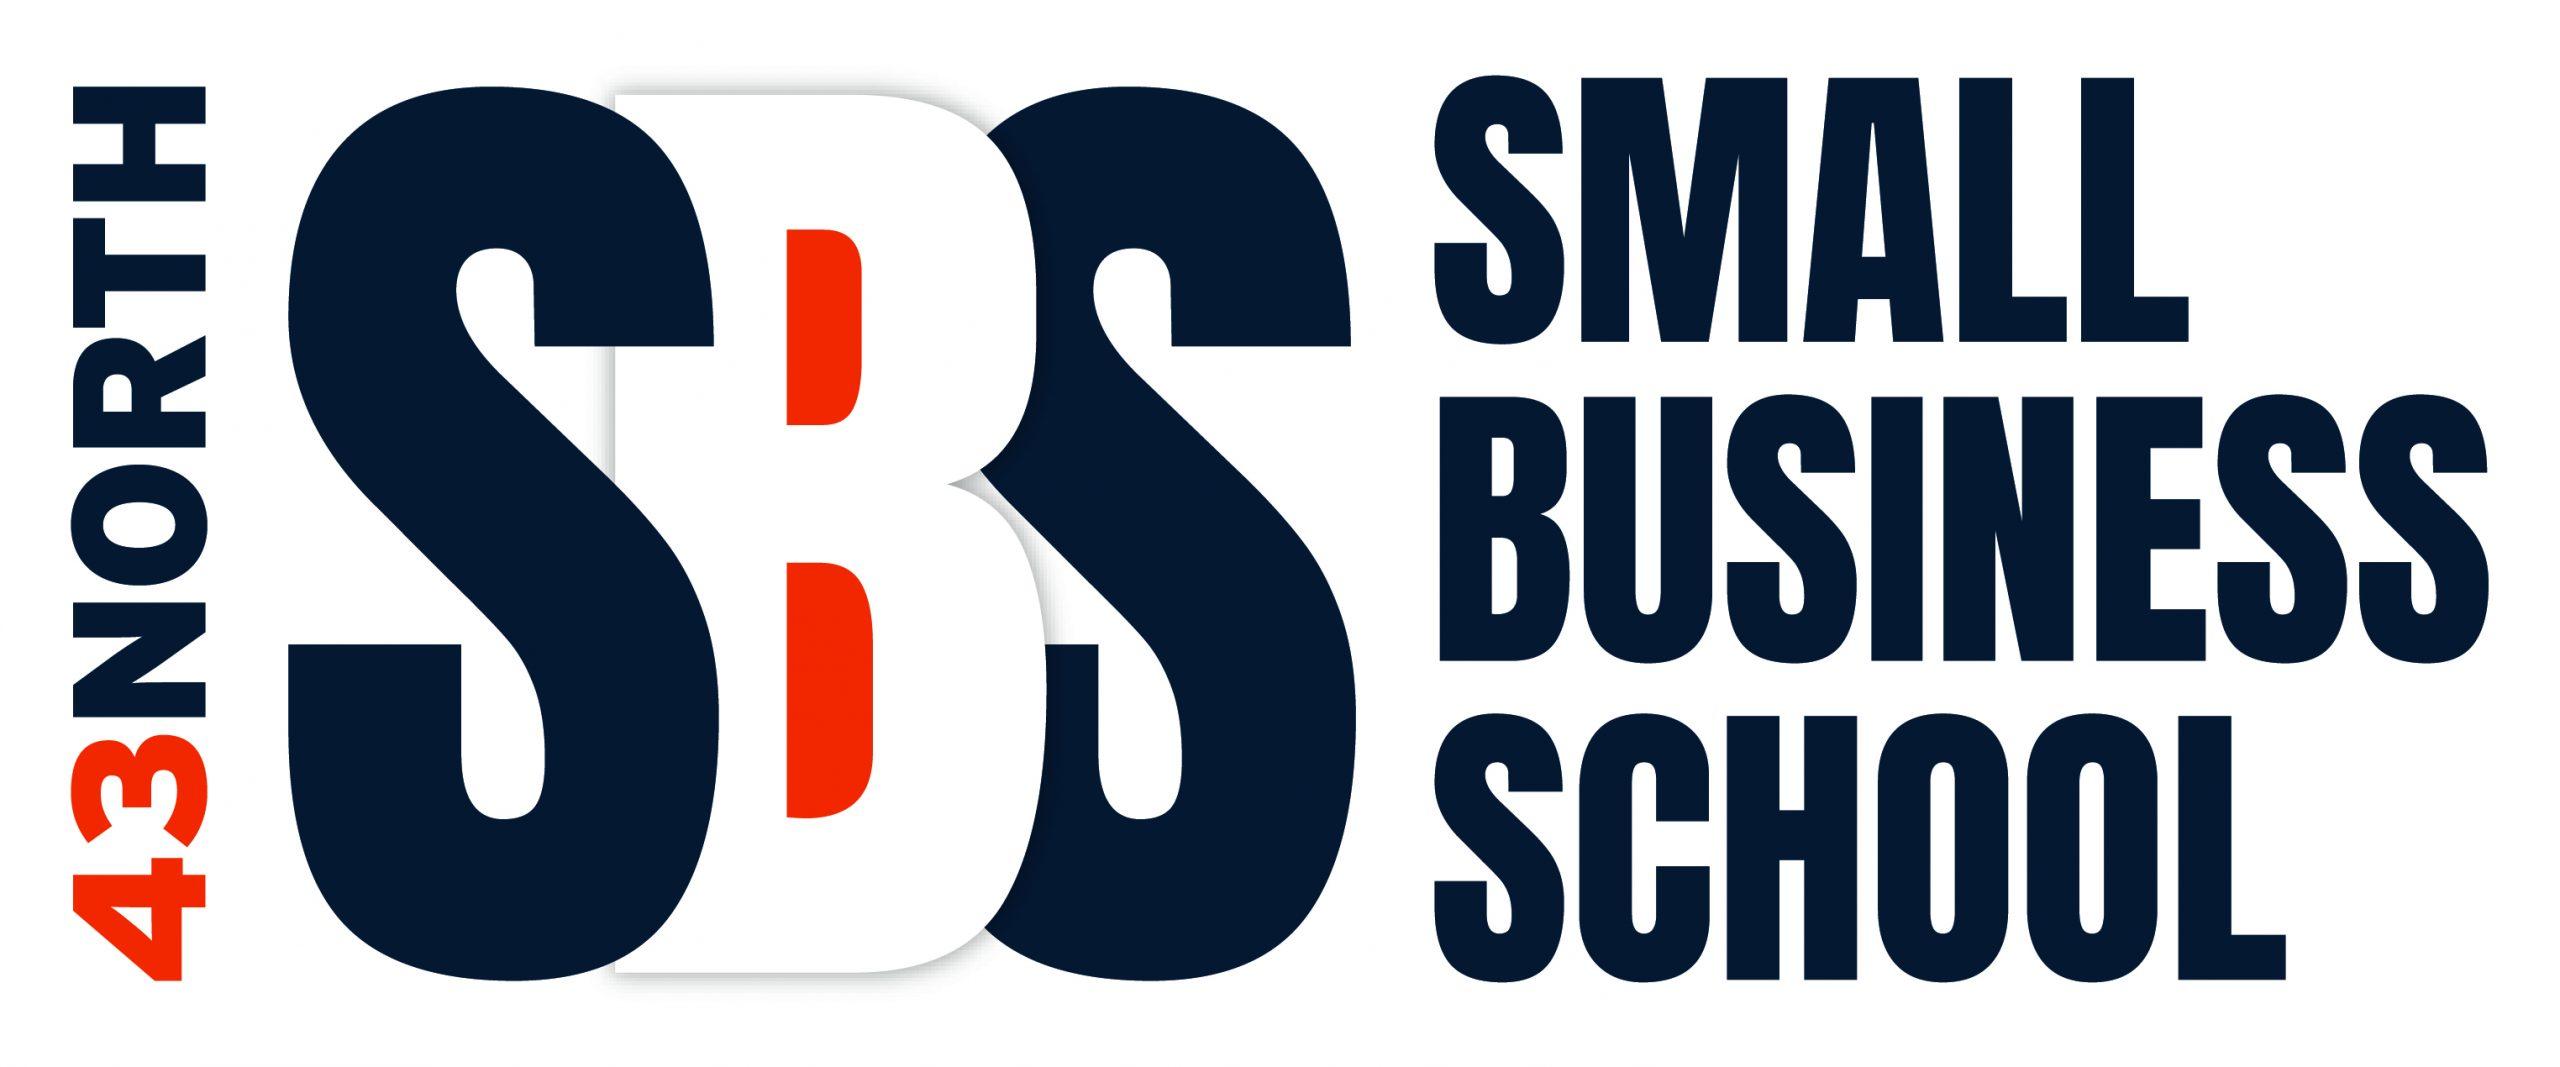 43North Small Business School